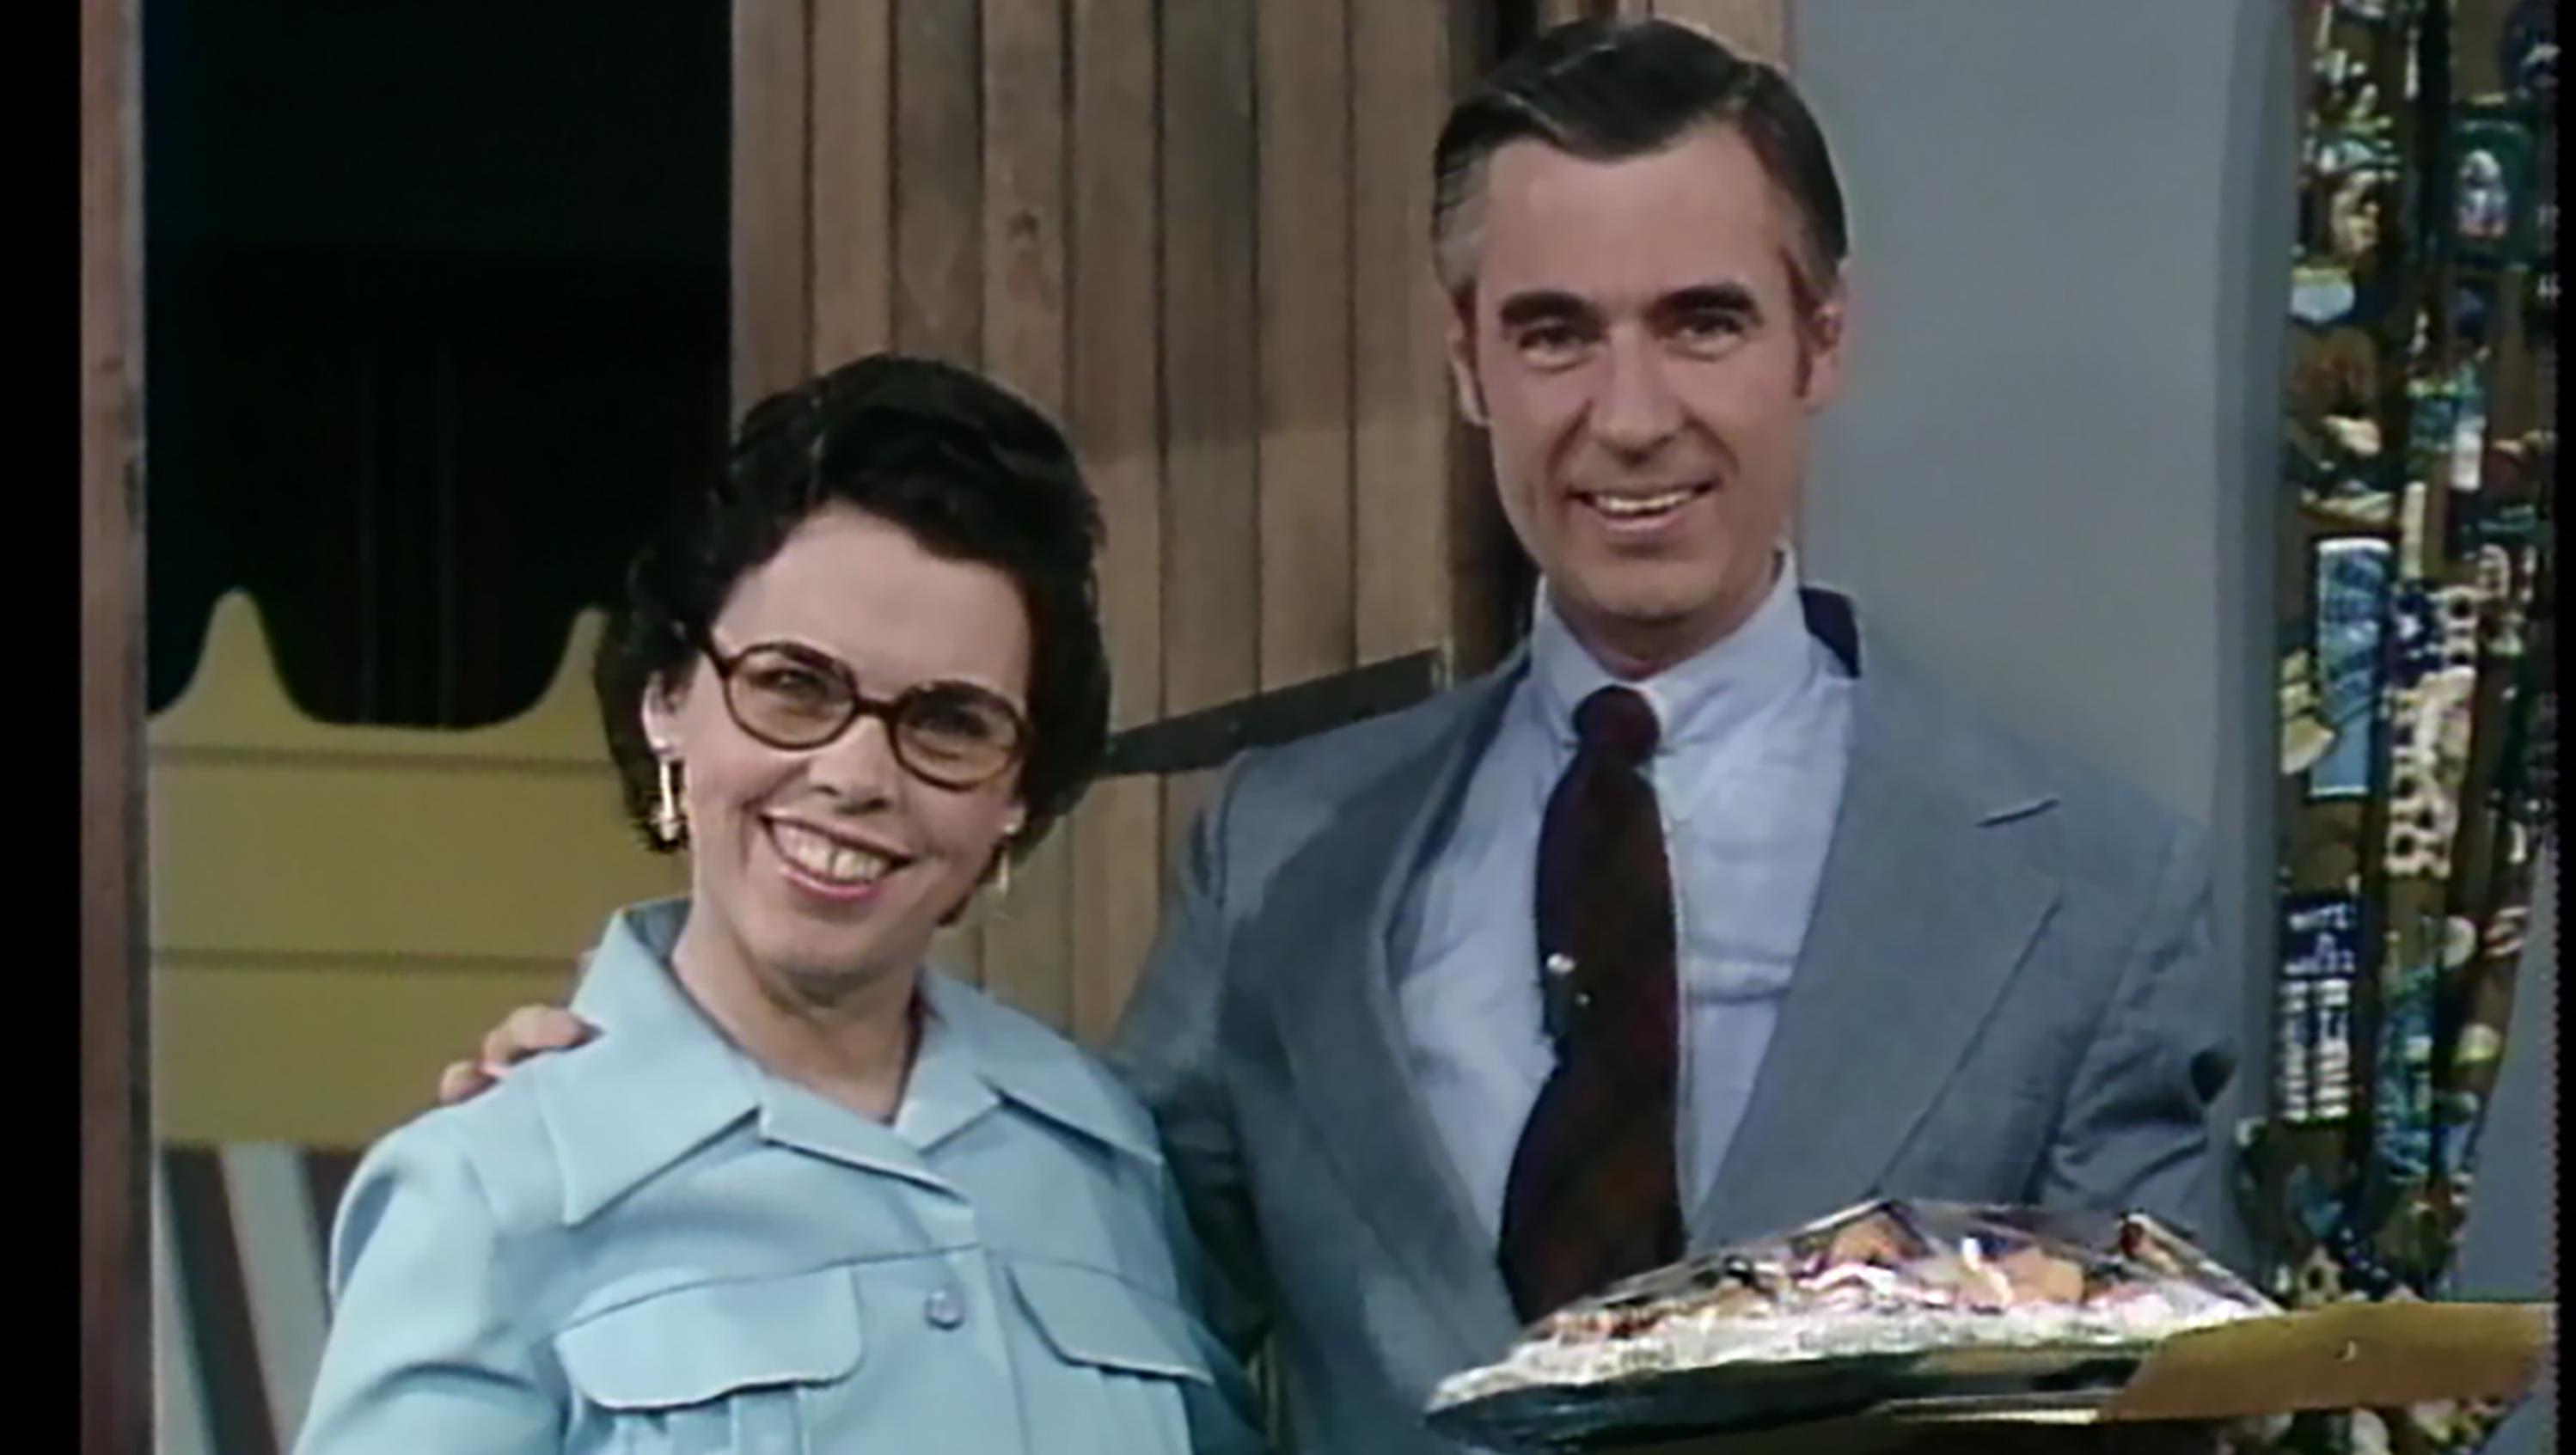 5 Ways To Celebrate Mister Rogers Neighborhood On Its 50th Anniversary